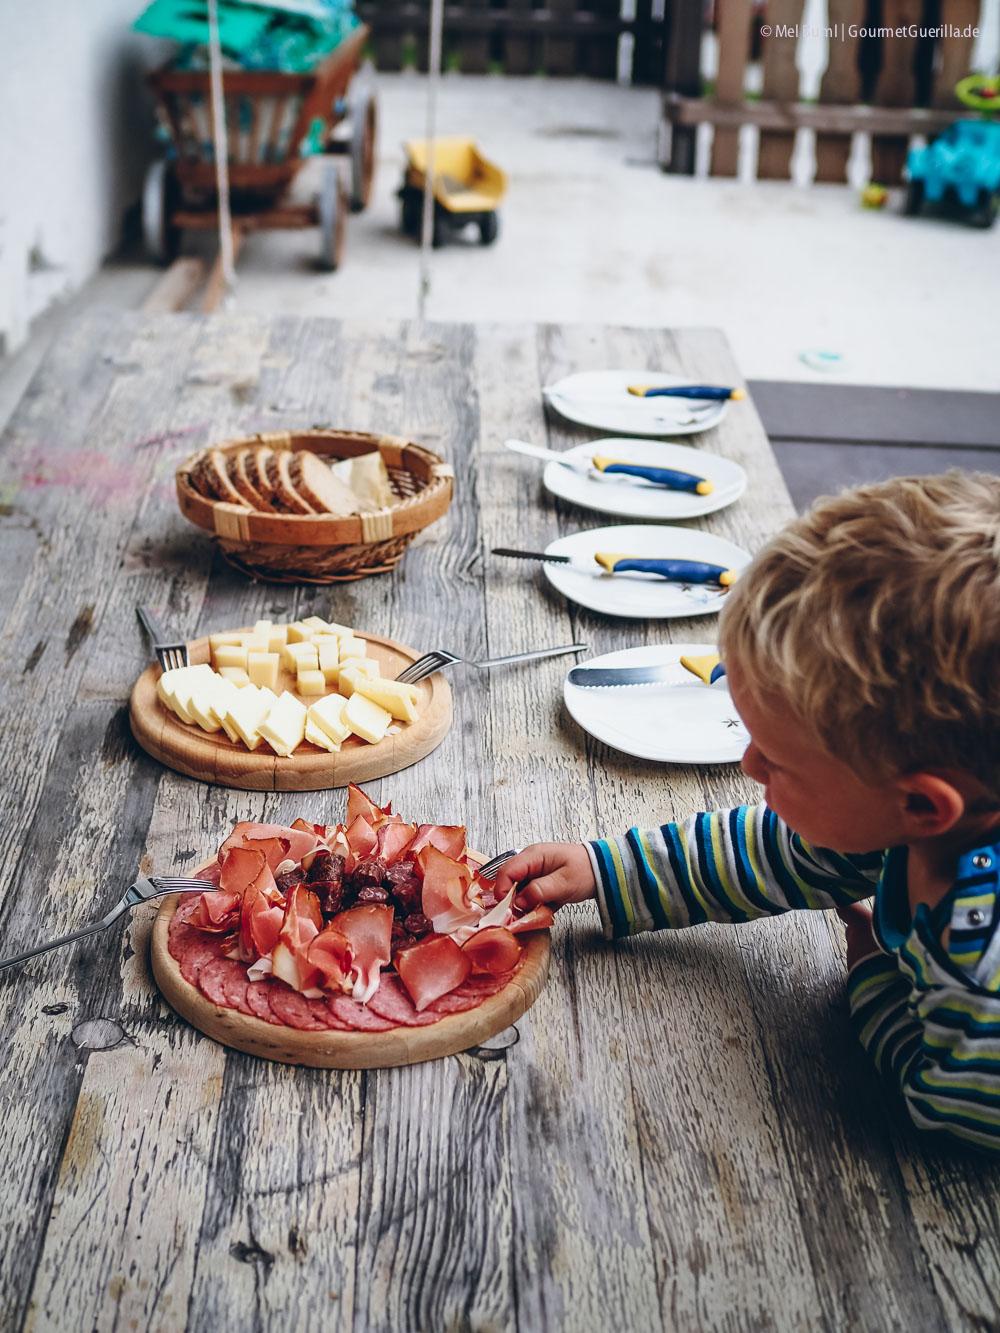 Jause Ahornhof Österreich Sennermeetsblogger | GourmetGuerilla.de